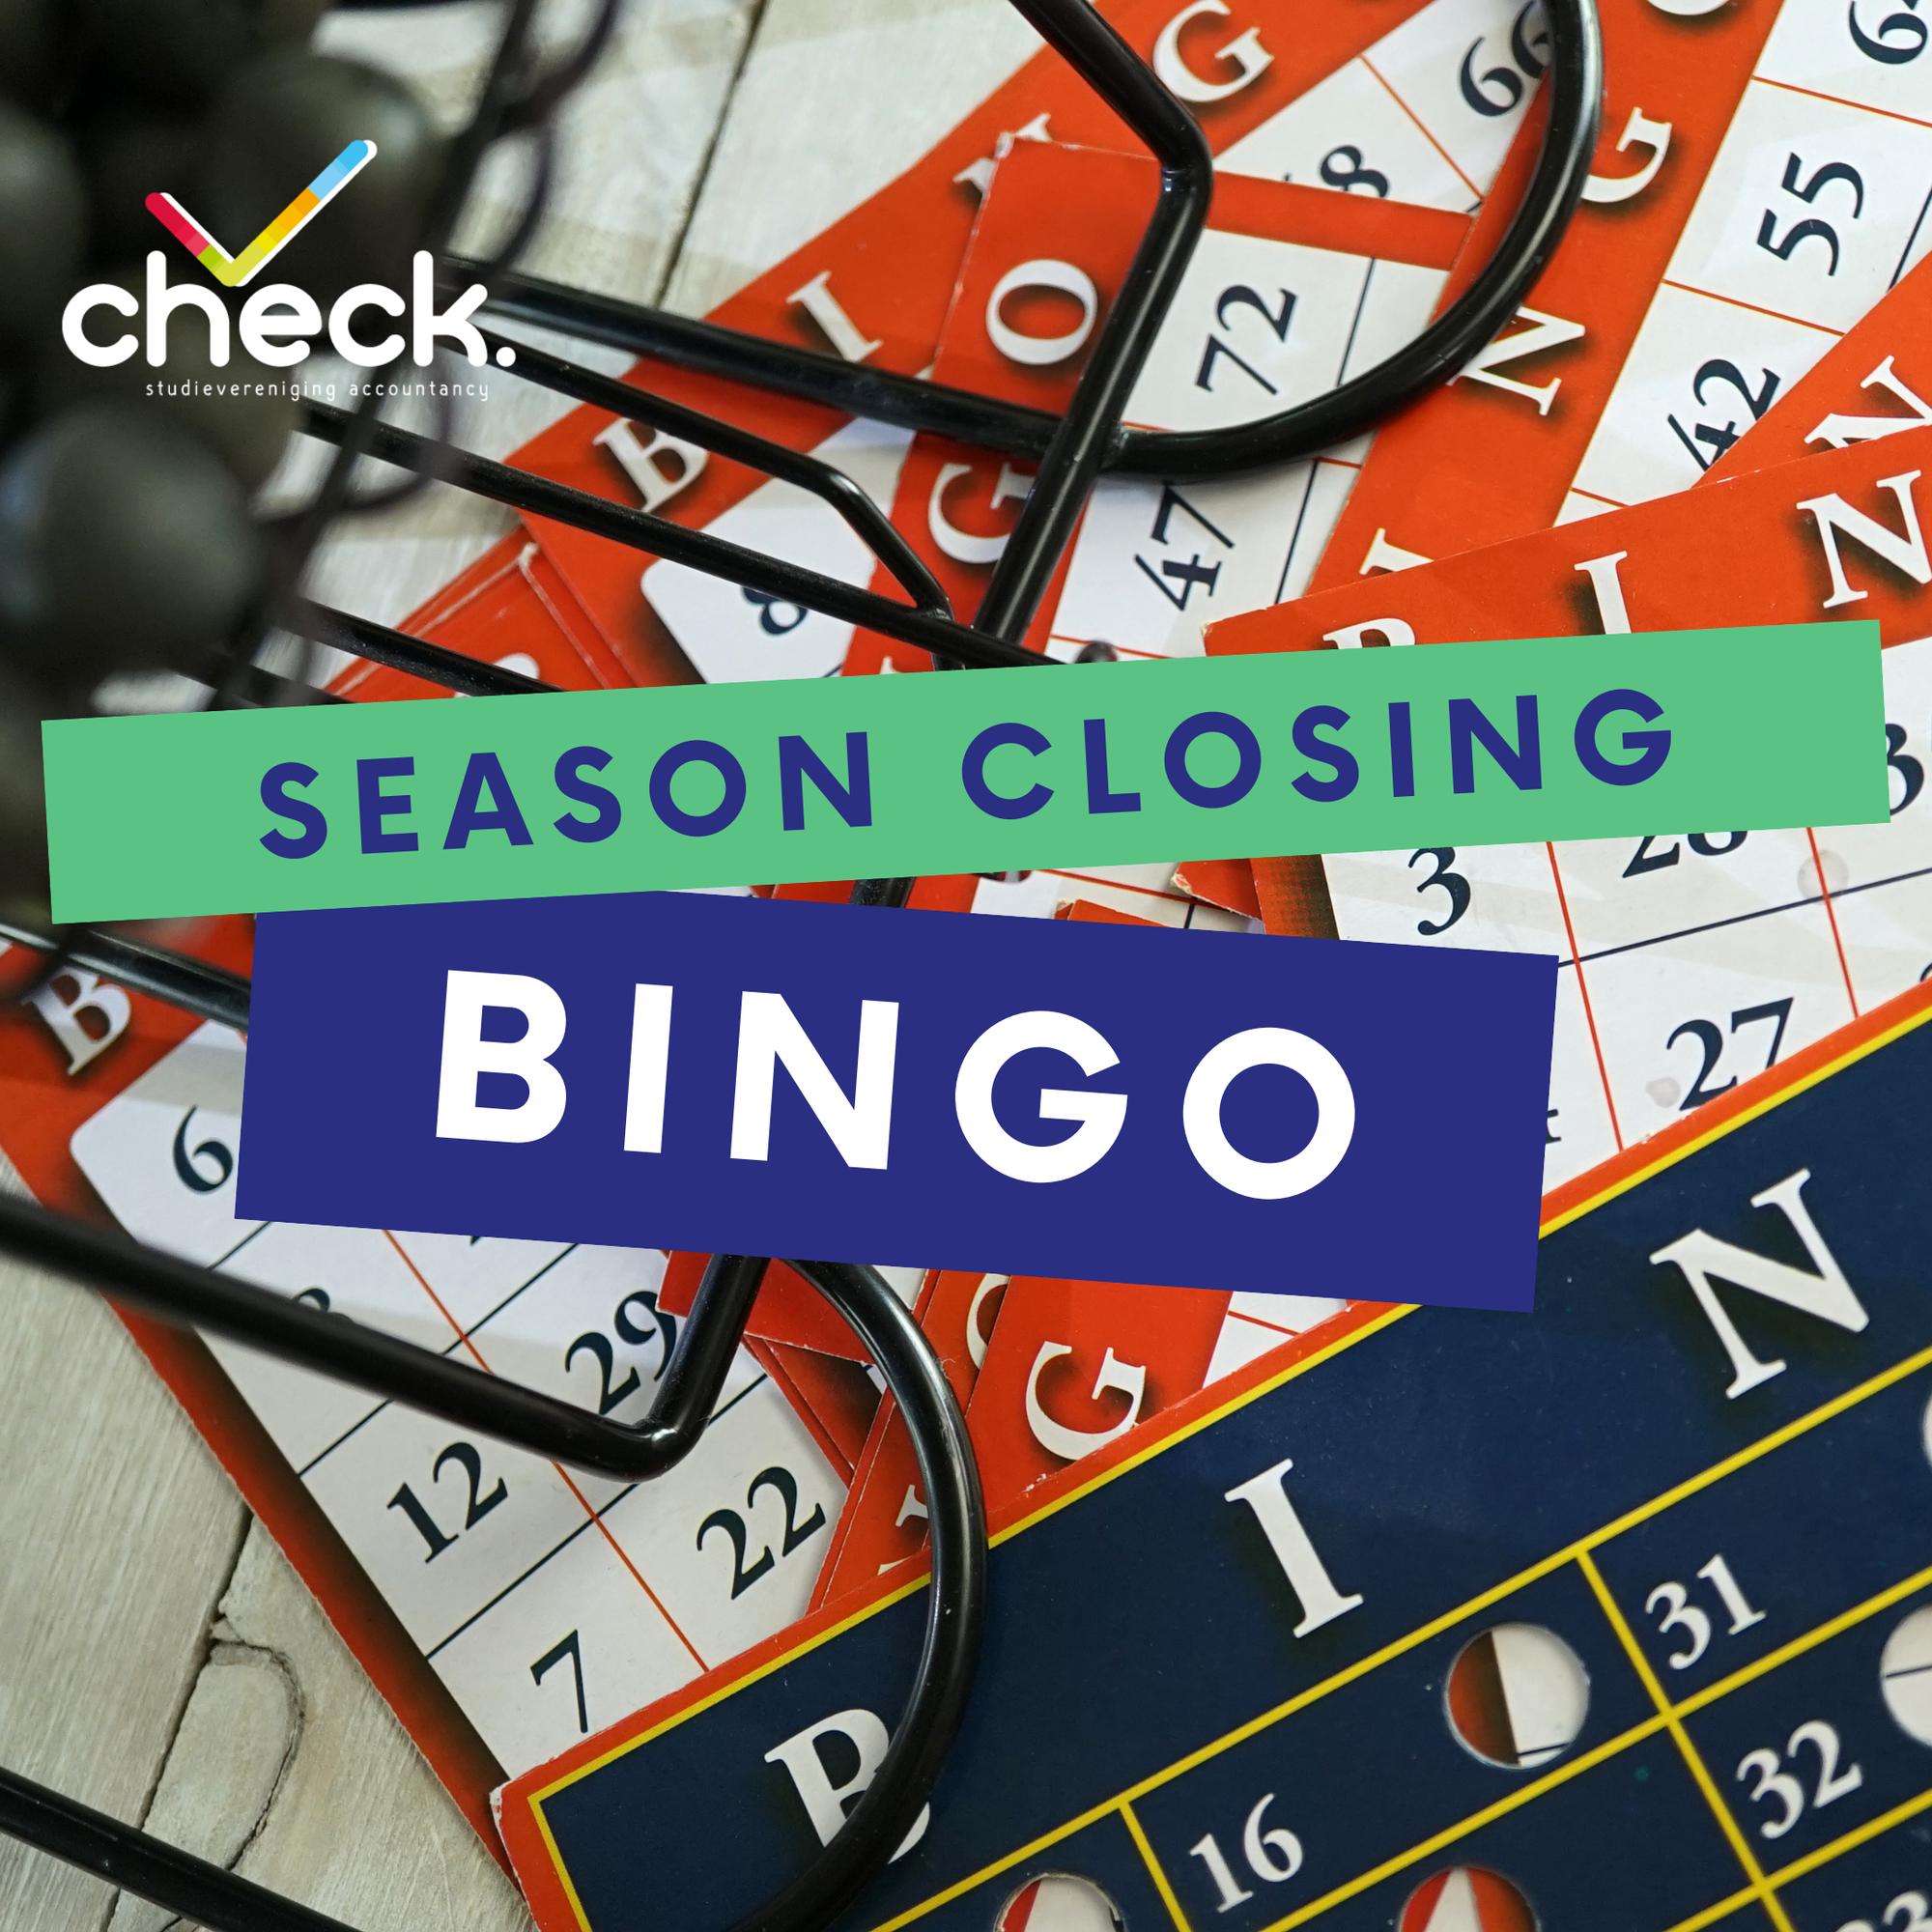 Season closing bingo